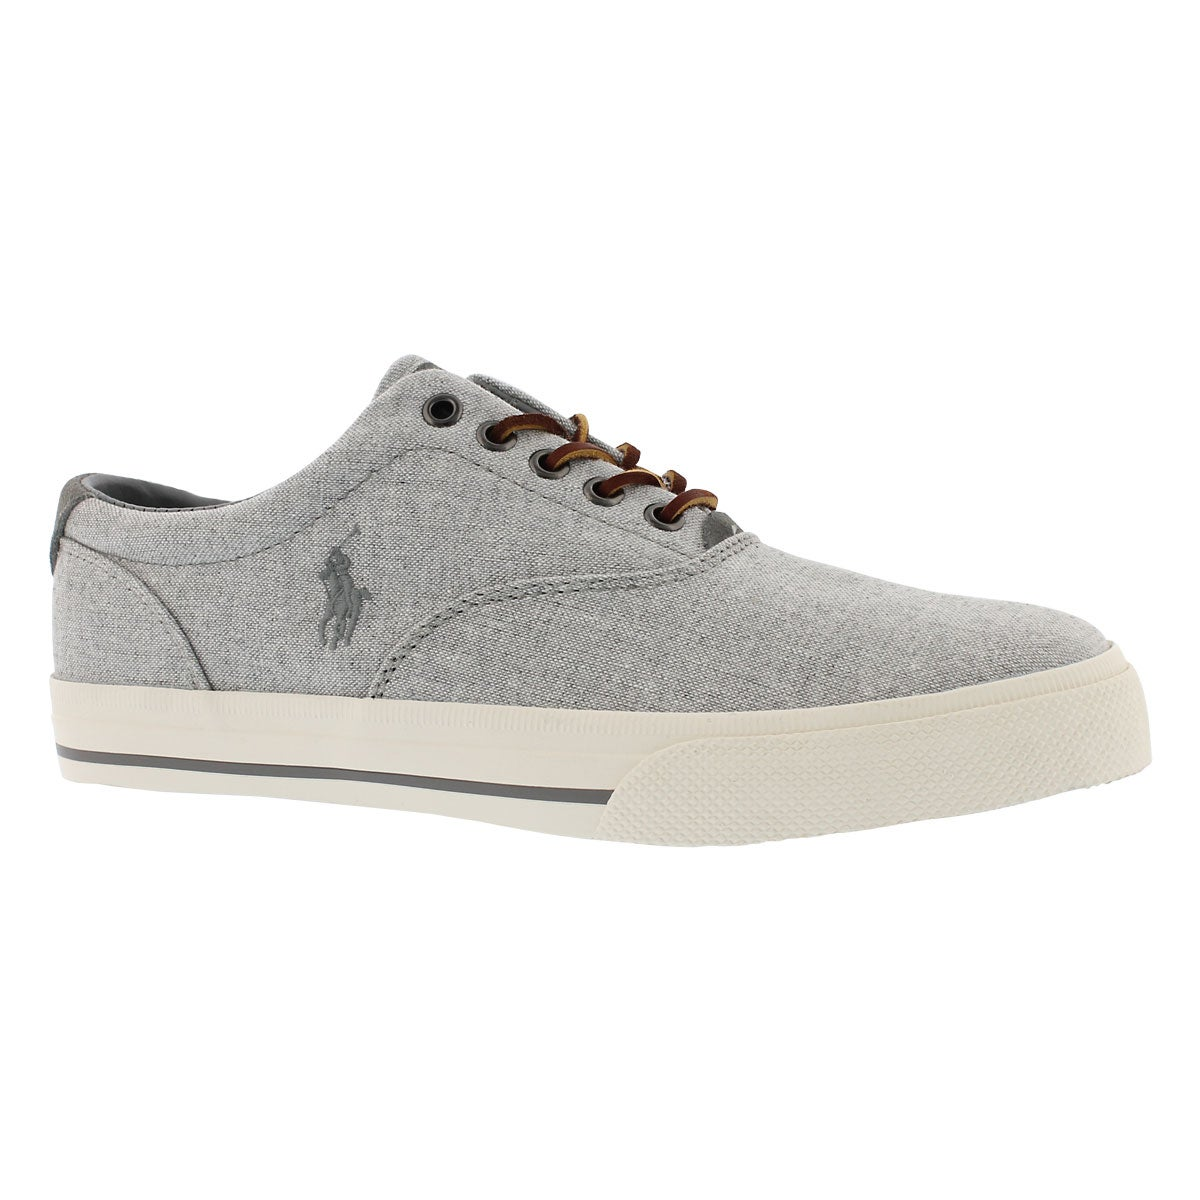 Men's VAUGHN grey yarn dyed canvas sneakers